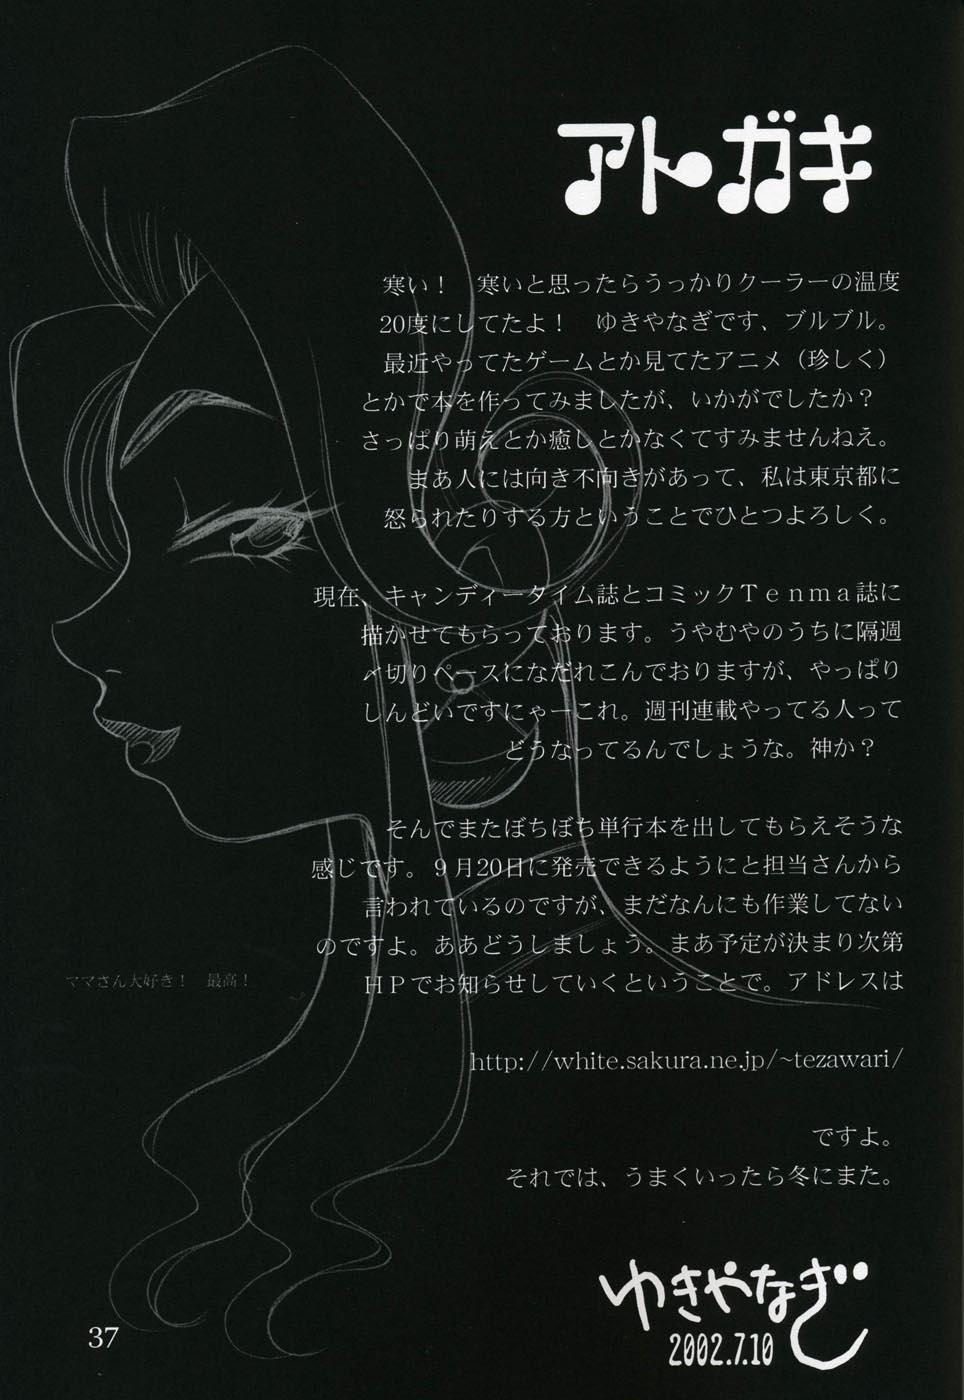 double kari princess kijoku: Shoujo_senki_brain_jacker